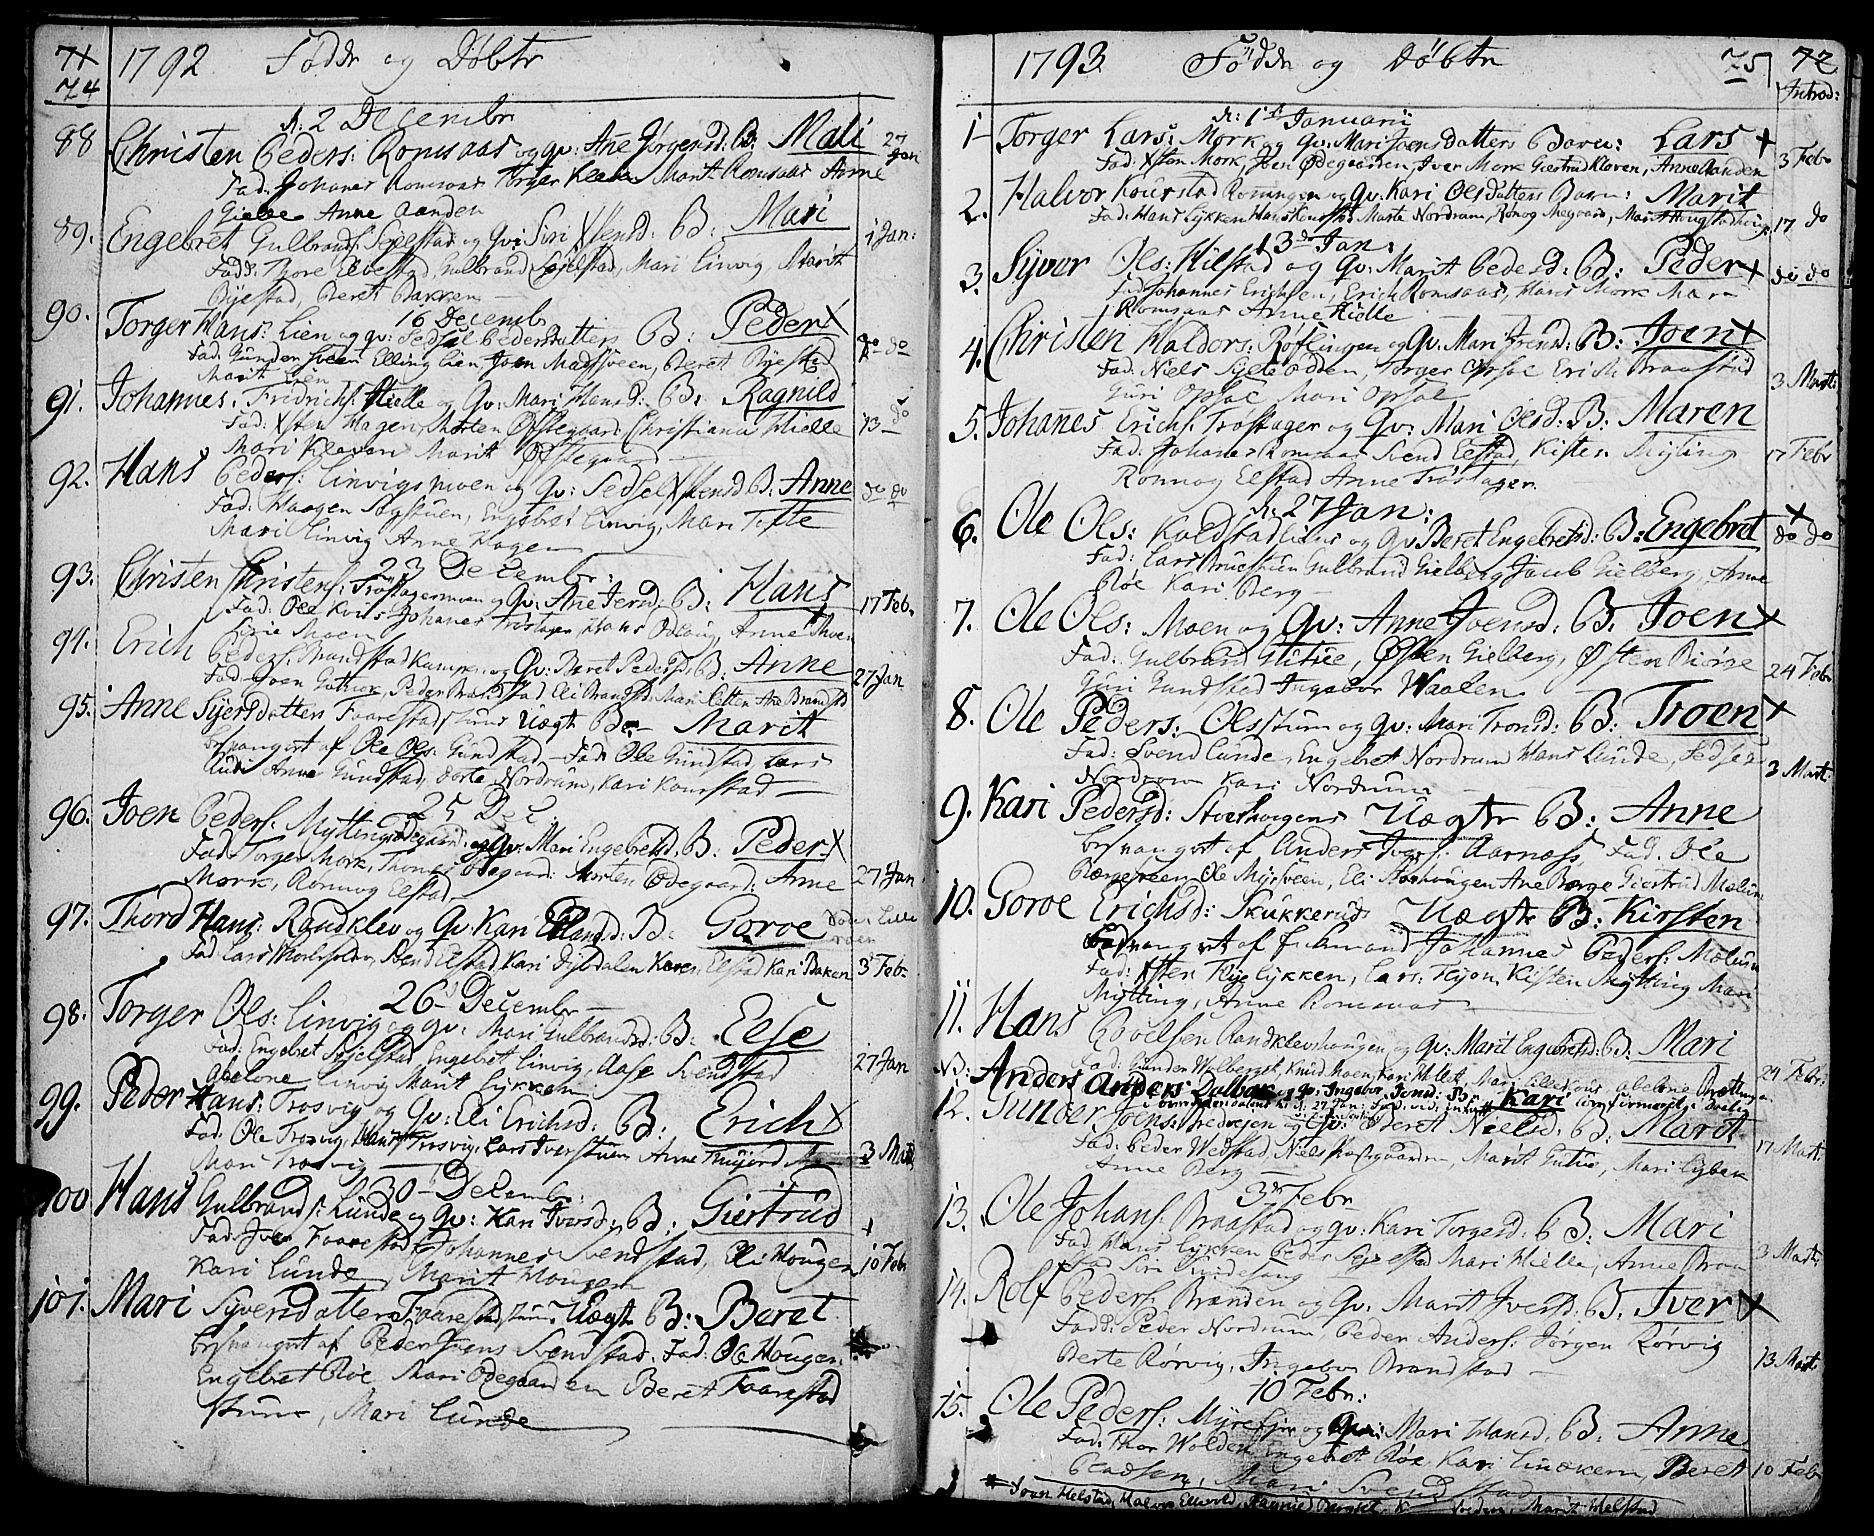 SAH, Ringebu prestekontor, Ministerialbok nr. 3, 1781-1820, s. 74-75